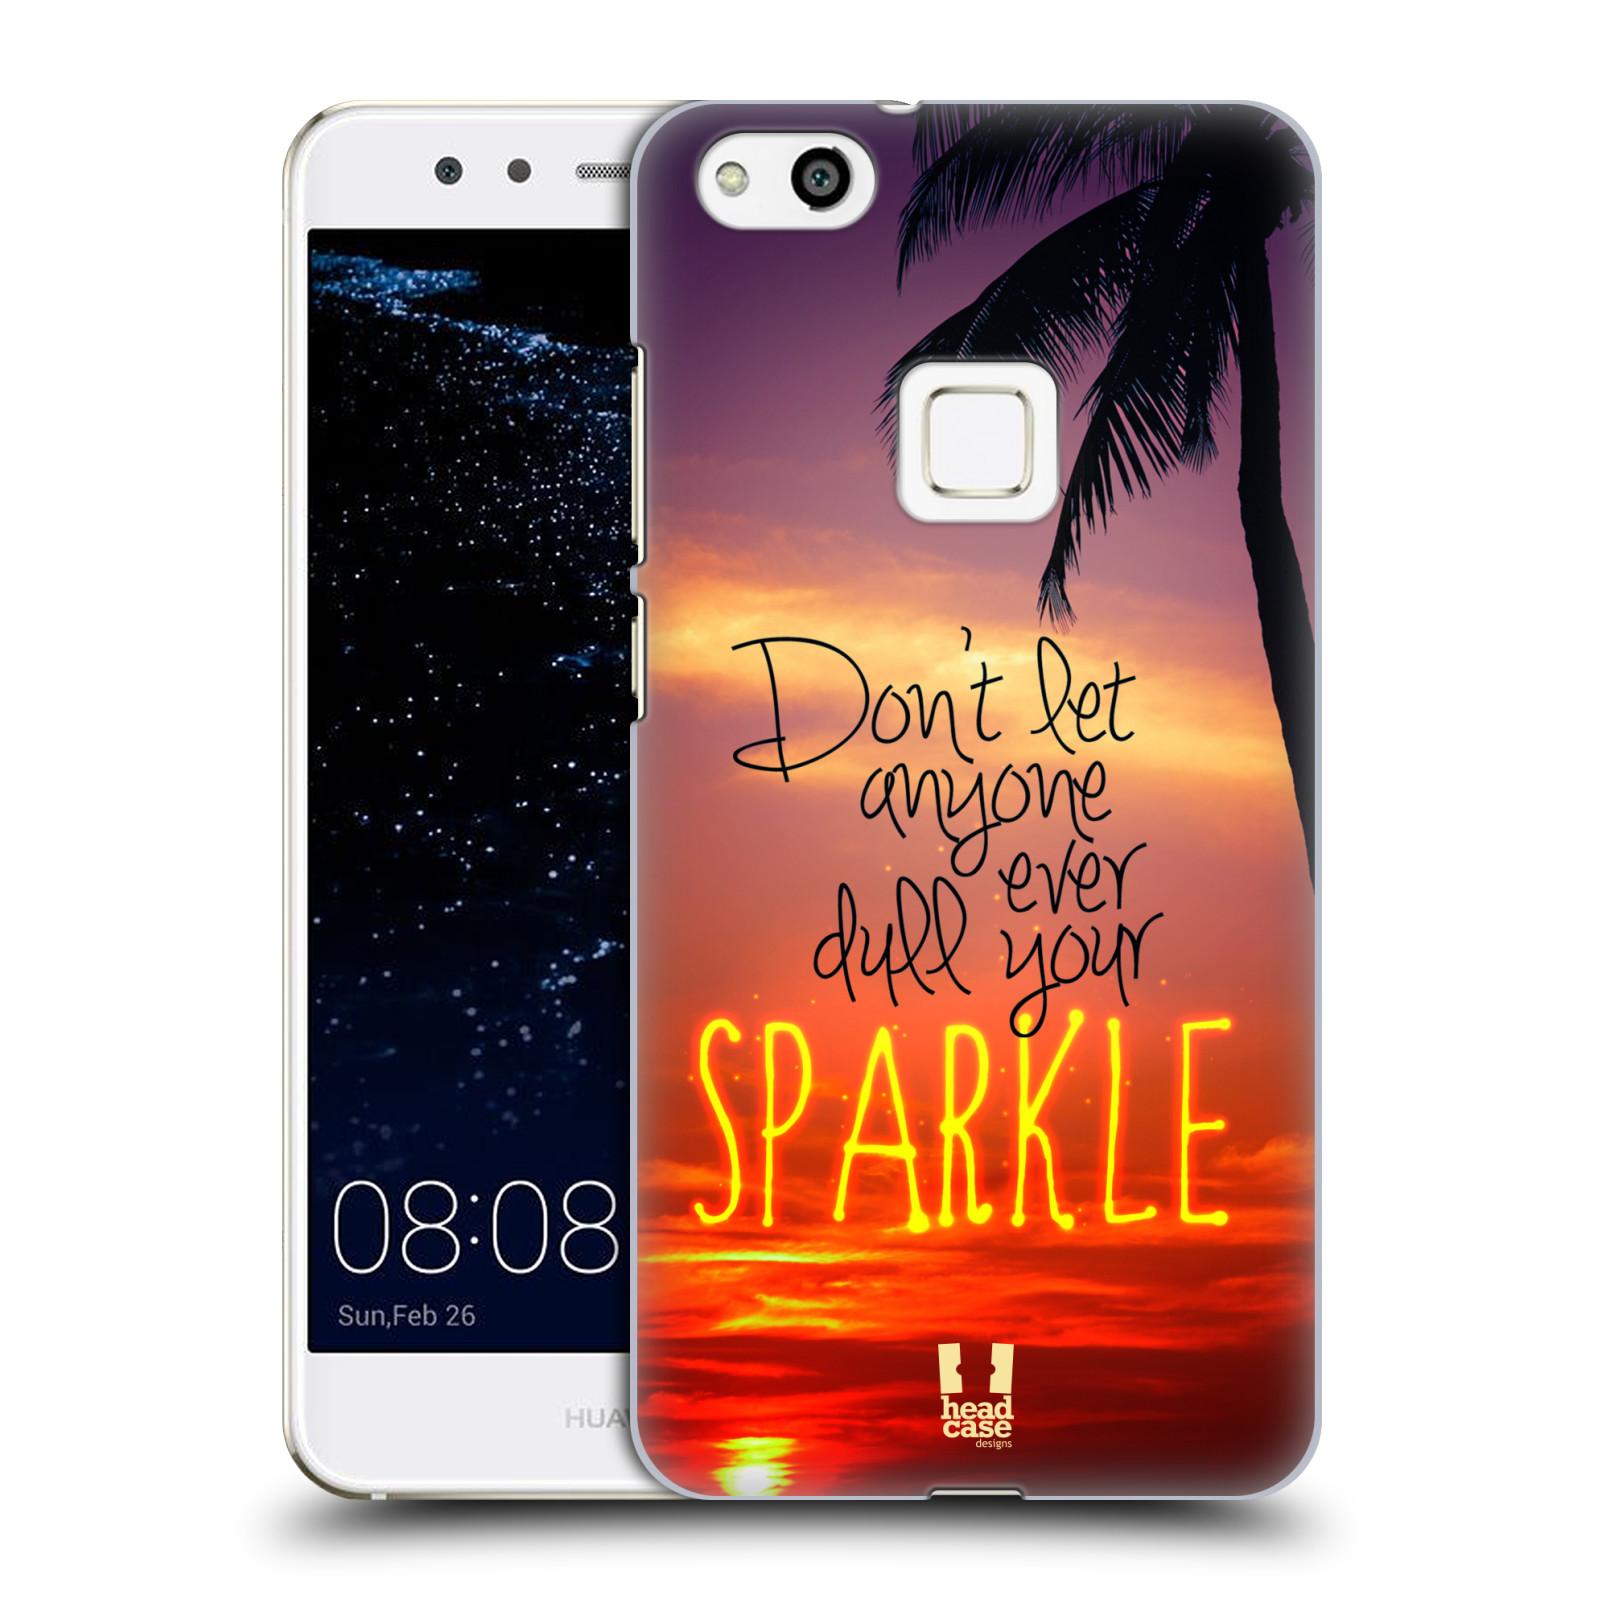 Plastové pouzdro na mobil Huawei P10 Lite Head Case - SPARKLE (Plastový kryt či obal na mobilní telefon Huawei P10 Lite Dual SIM (LX1/LX1A))